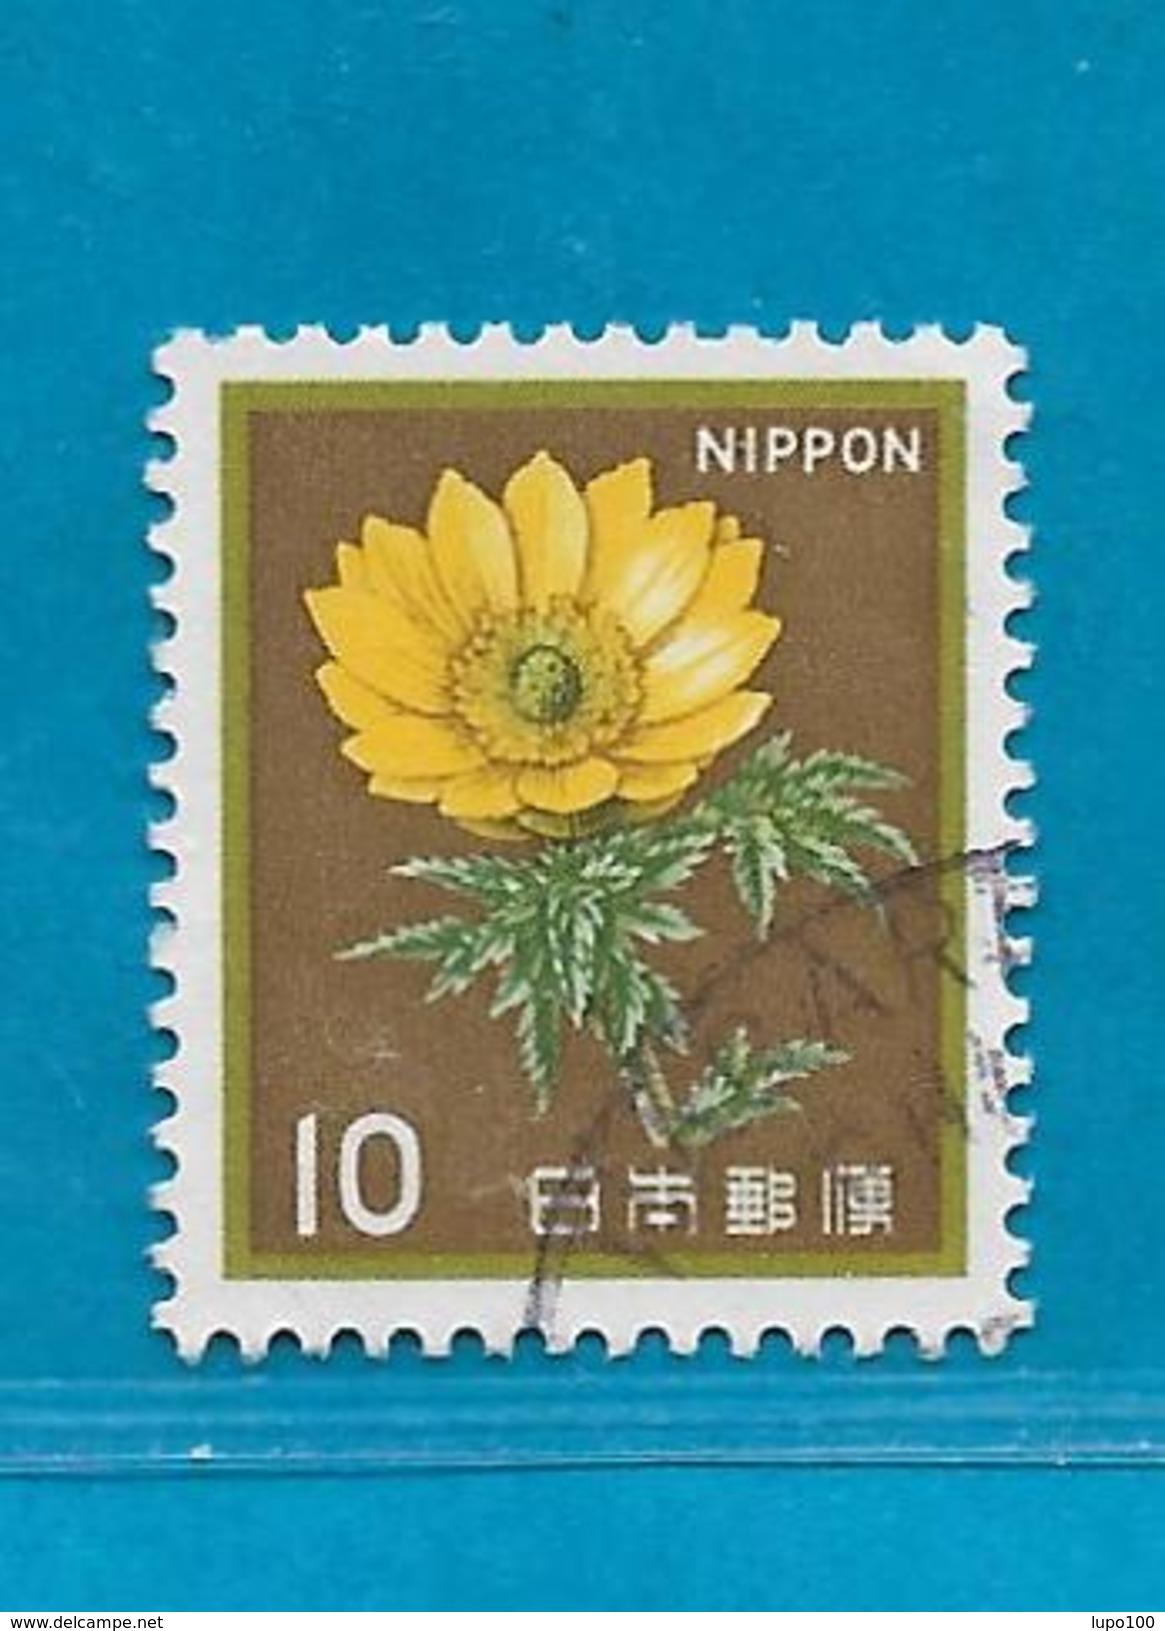 1982 GIAPPONE NIPPON FRANCOBOLLO USATO STAMP USED ORDINARIO FLORA FIORI 10 - Used Stamps